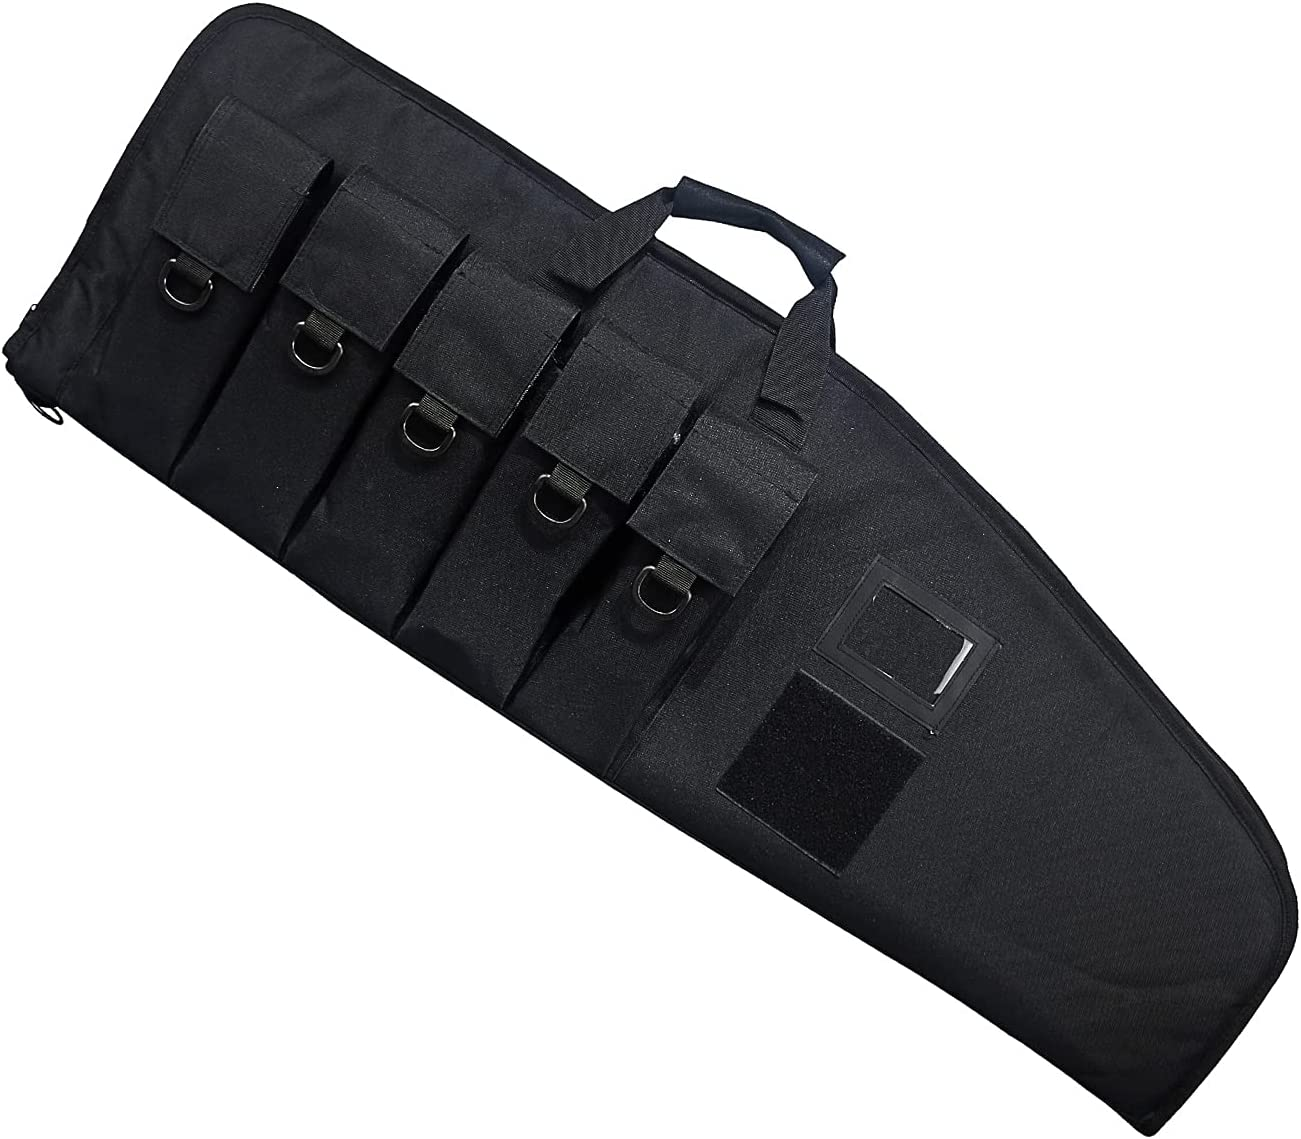 XWLSPORTS Ranking TOP2 Single Rifle Case Bag Gun Tactical Max 76% OFF